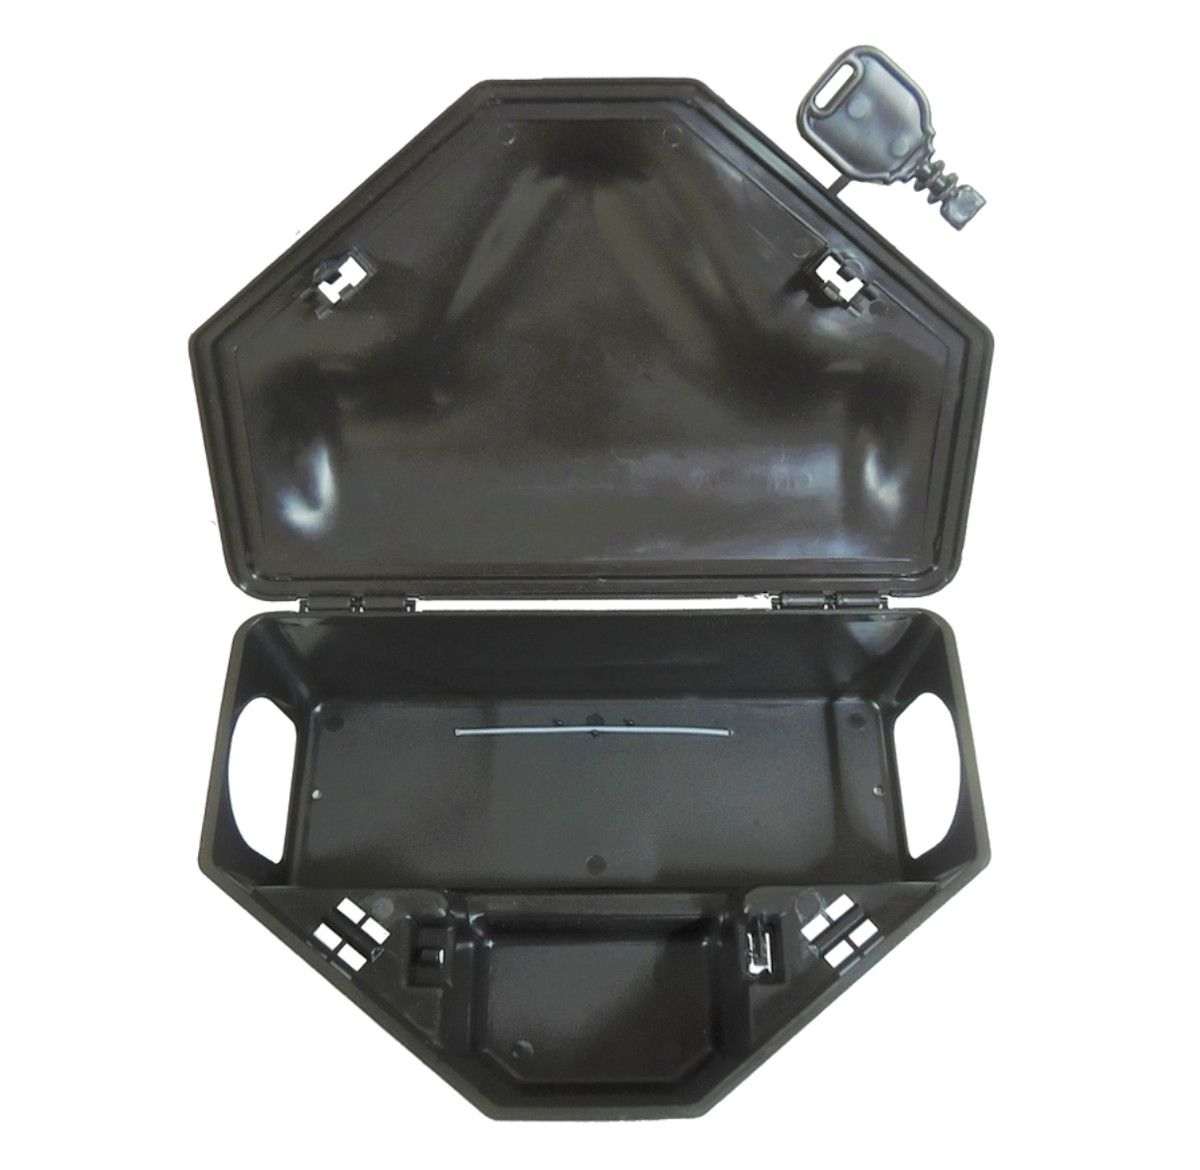 Kit 8 Porta Isca C/ 2 Chaves + 8 Bloco Extrusado Mata Seca